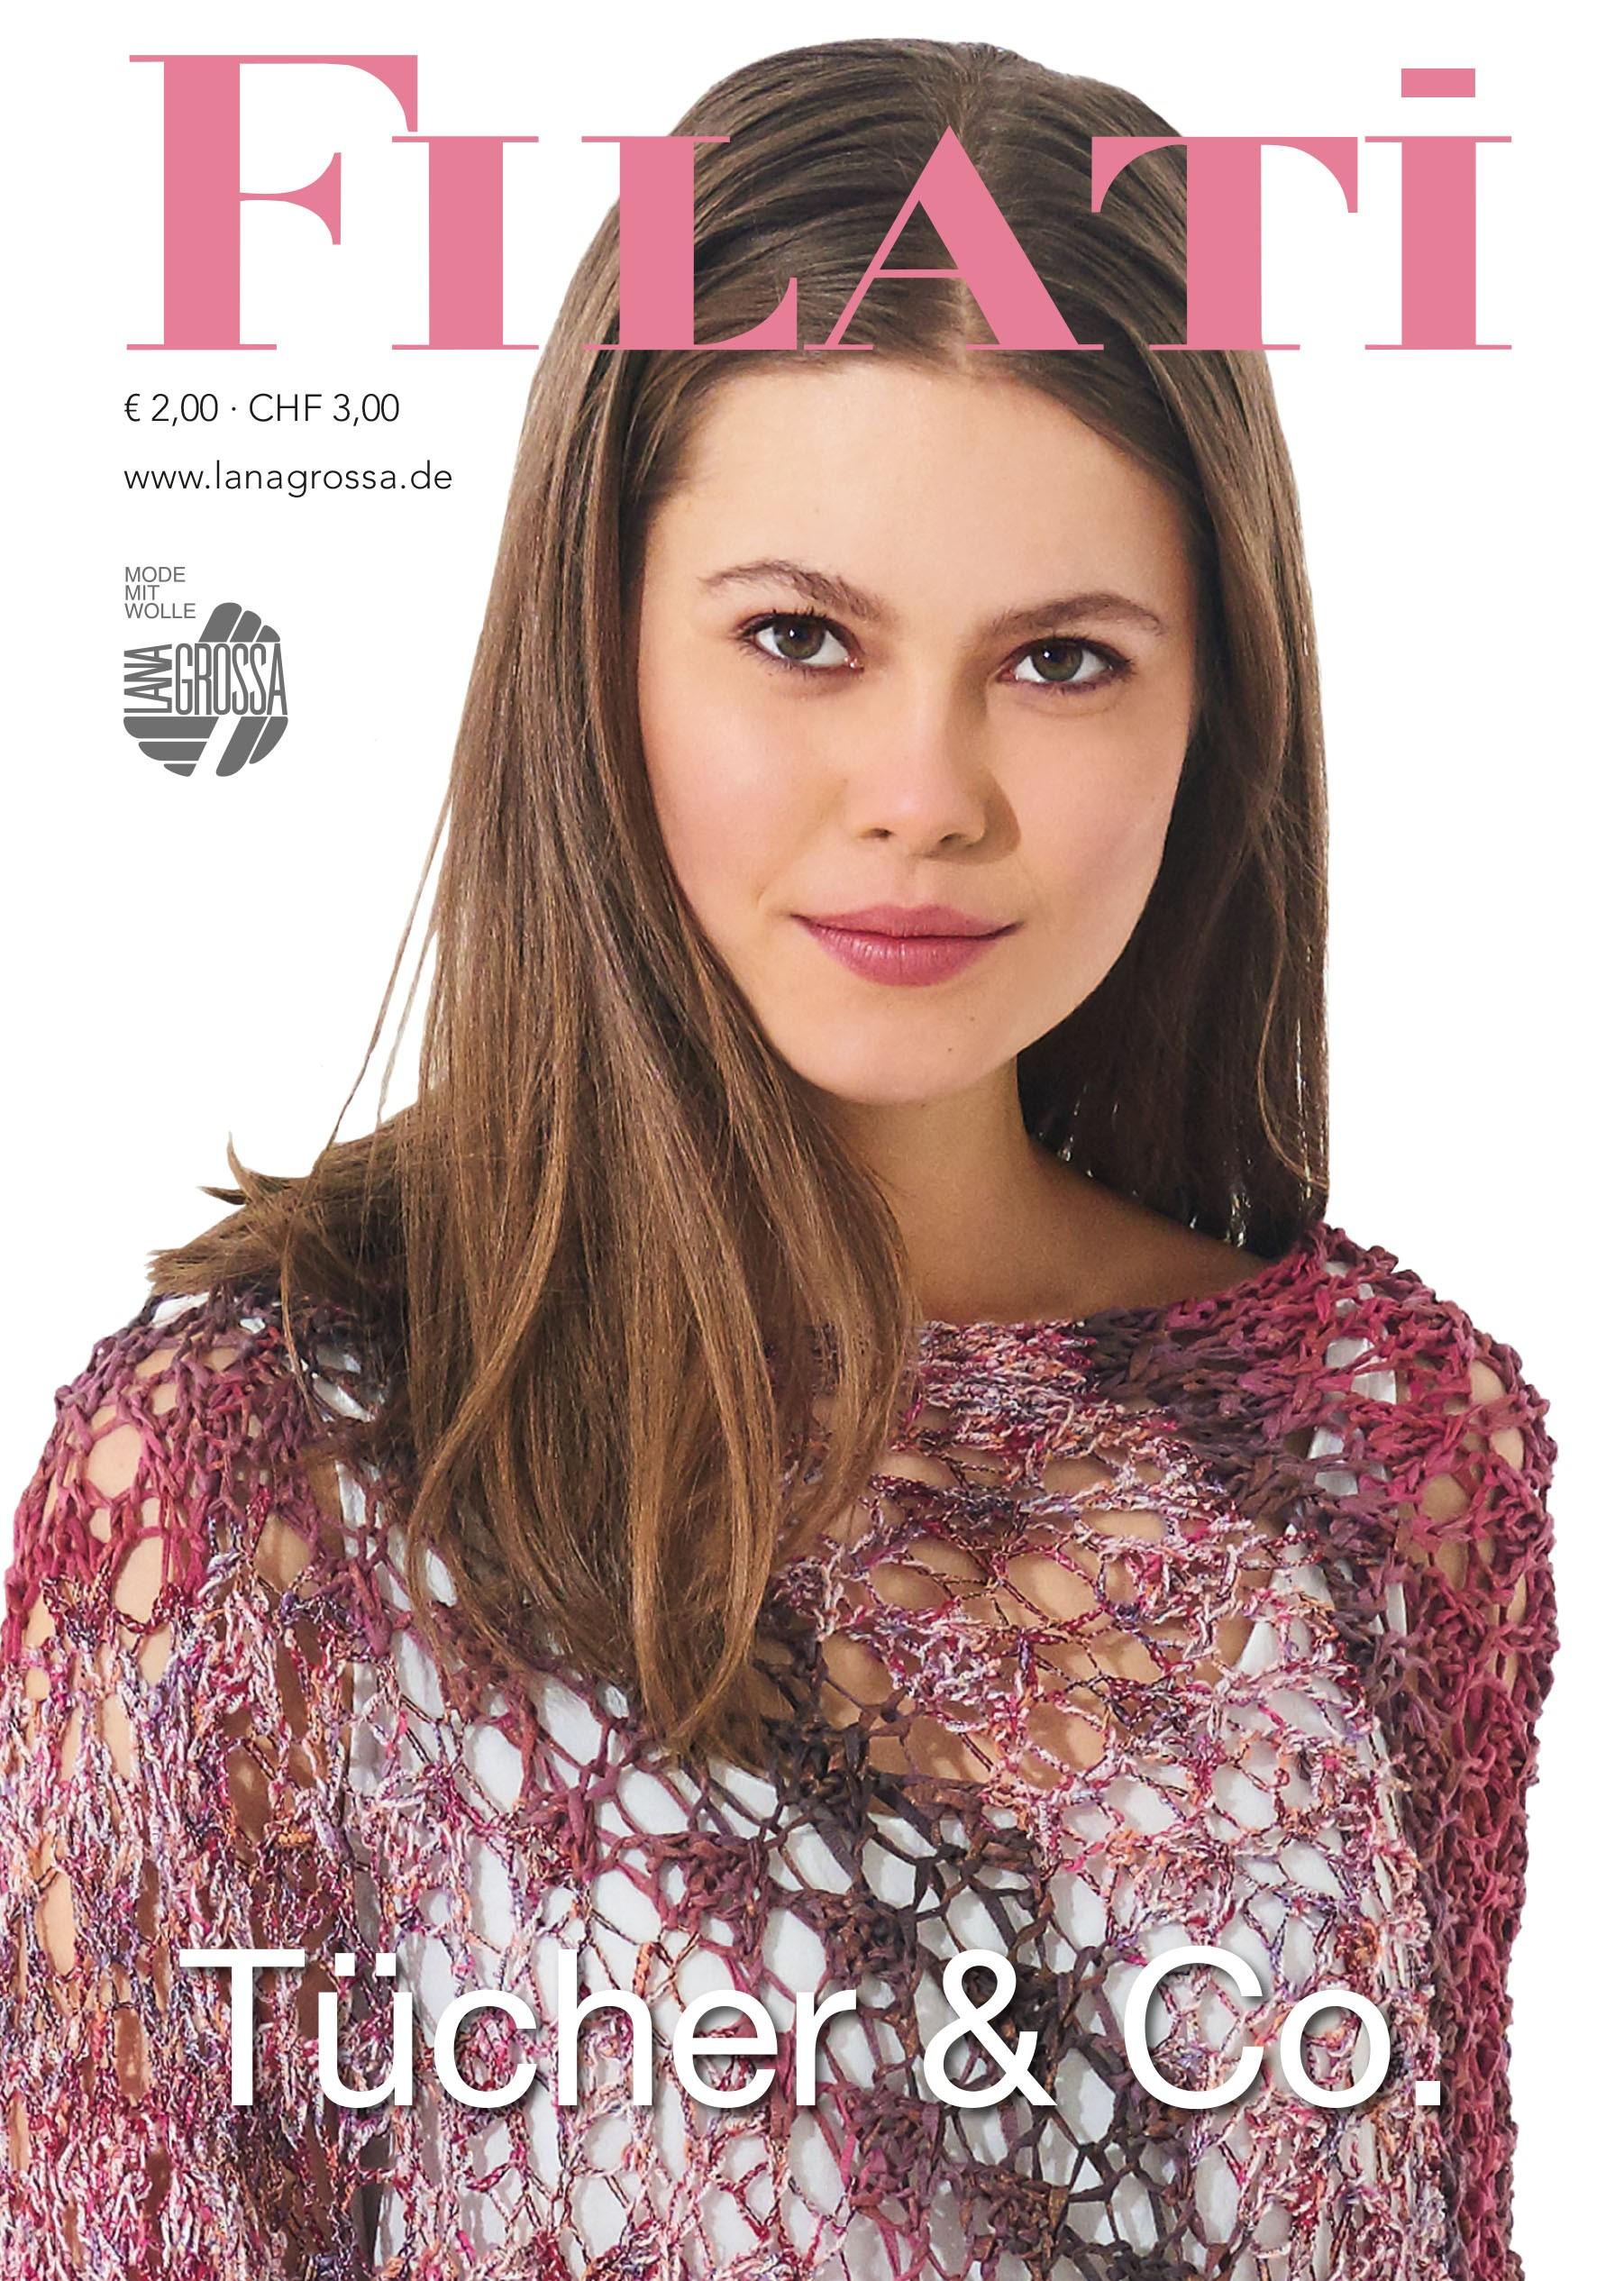 Lana Grossa FILATI Tücher & Co. - German Edition